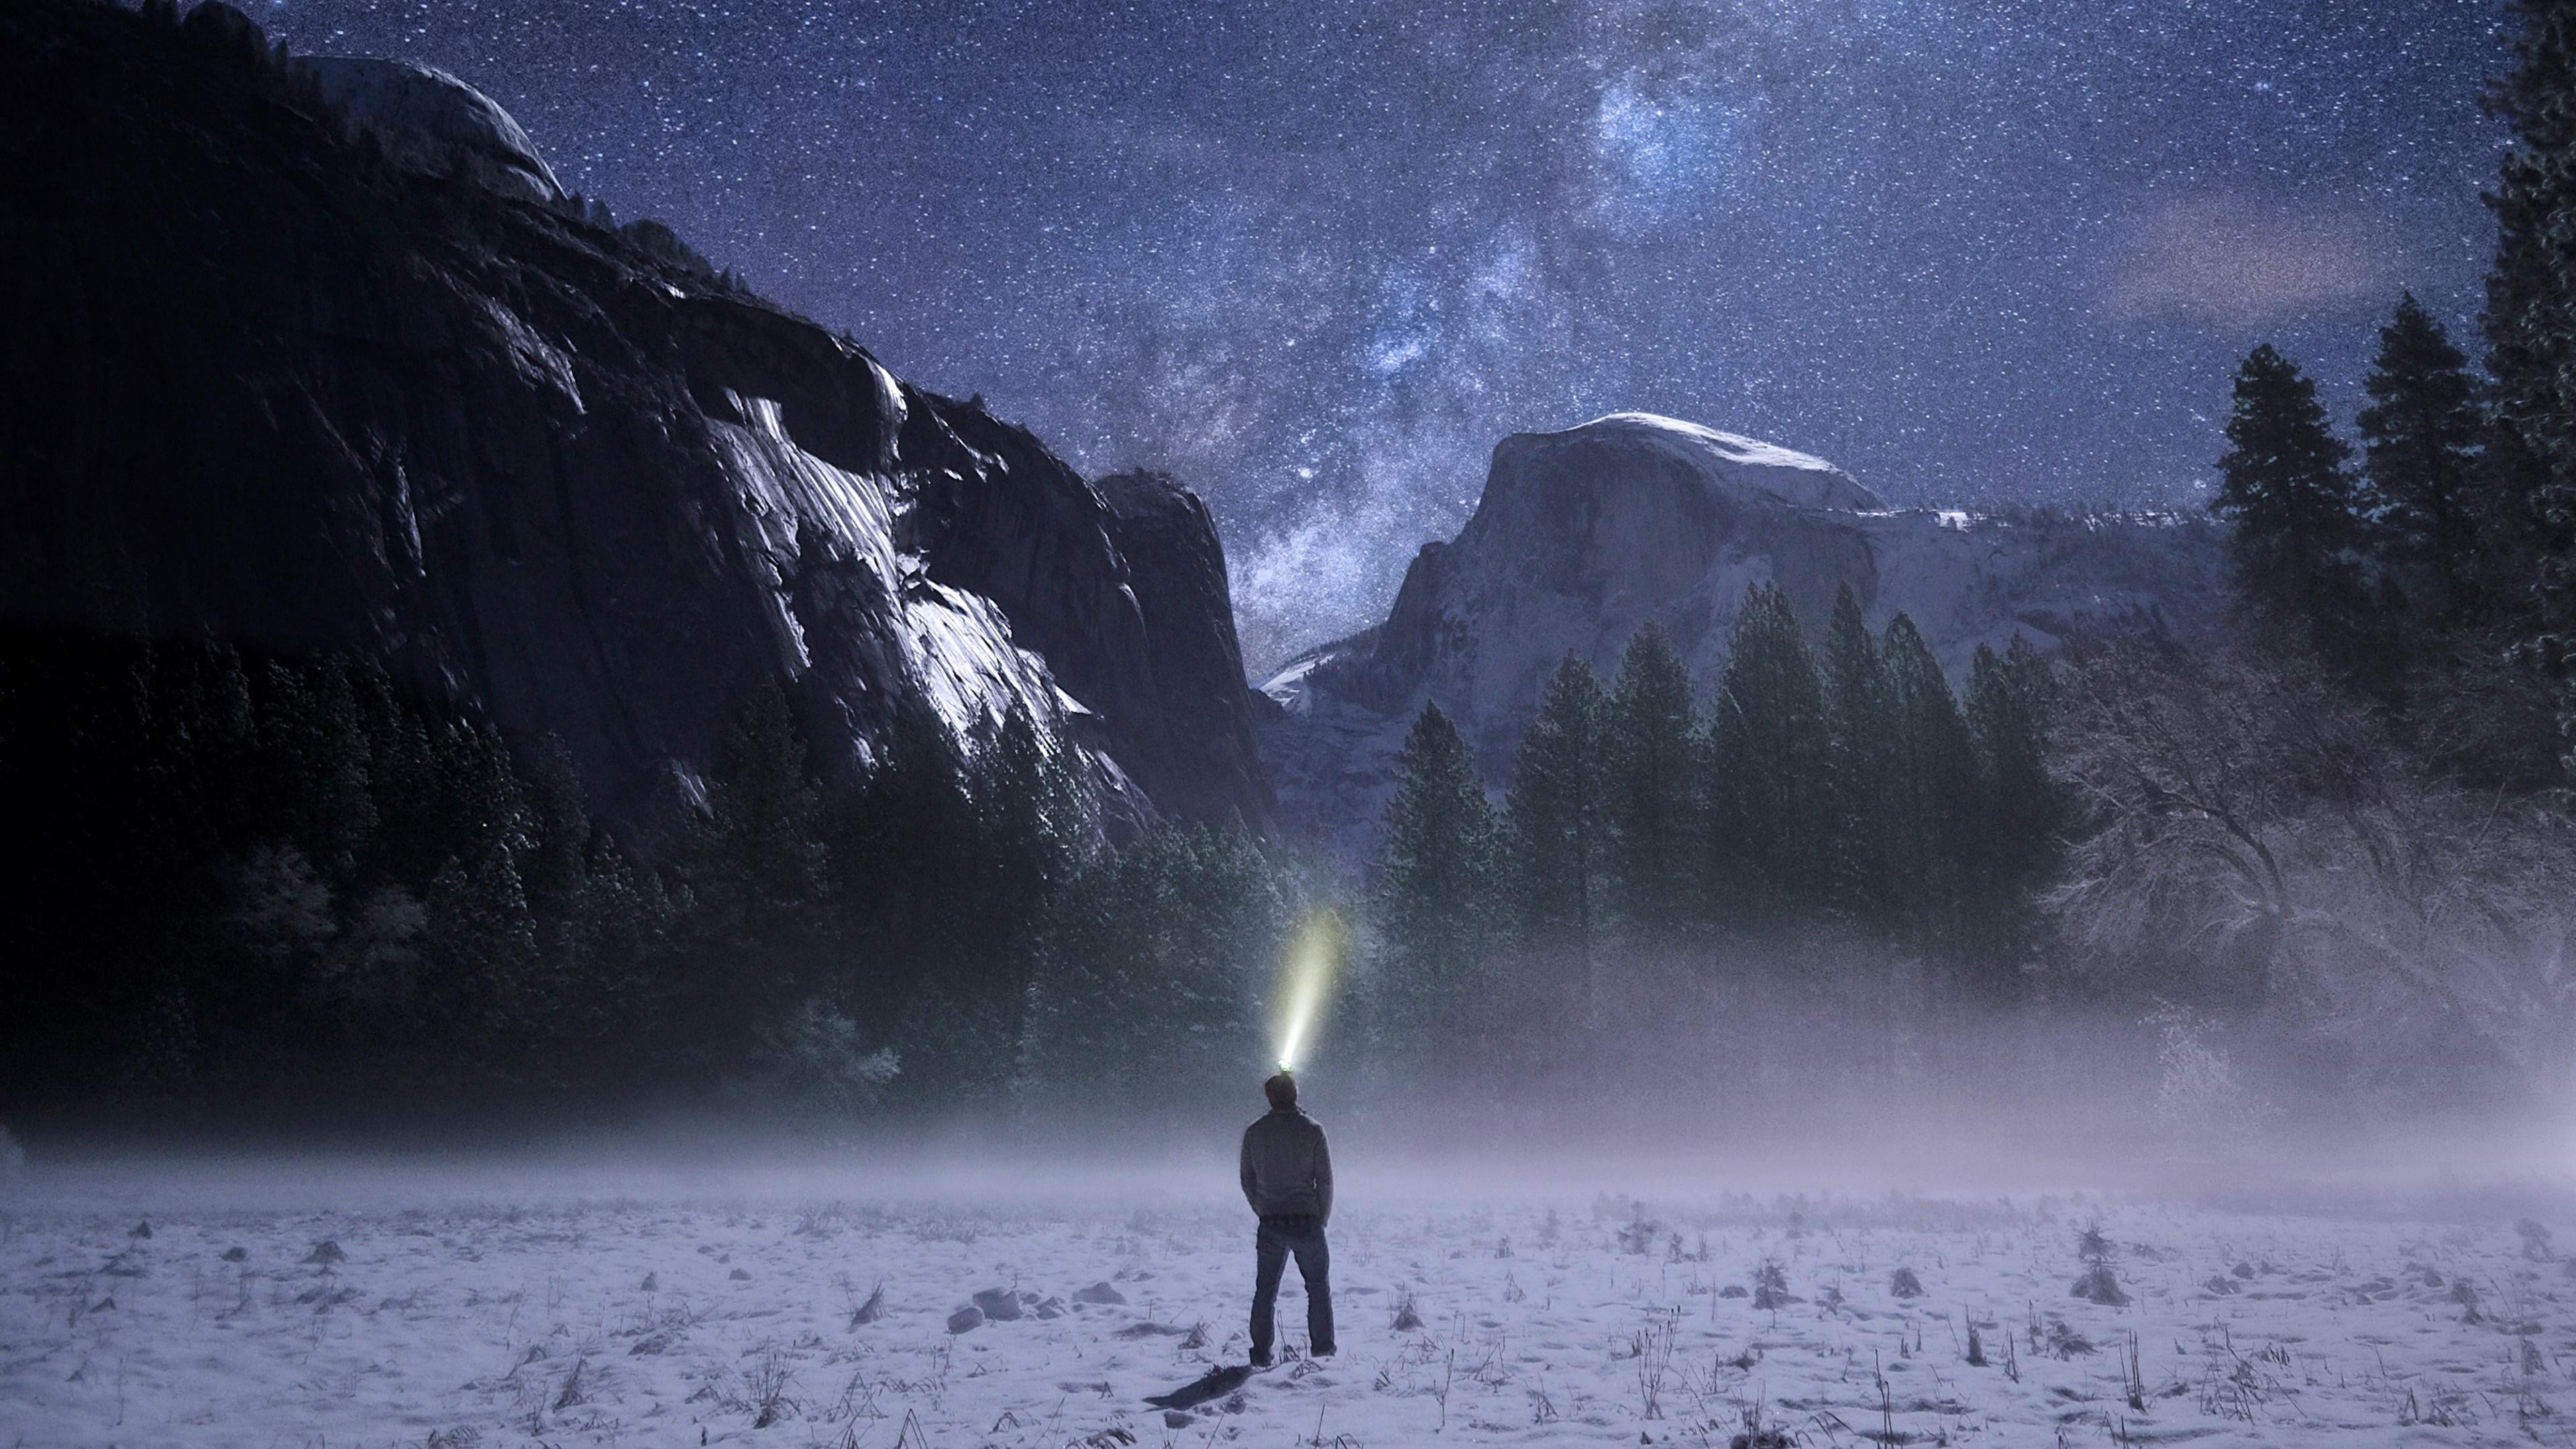 Man with headlight at Yosemite Valley wallpaper